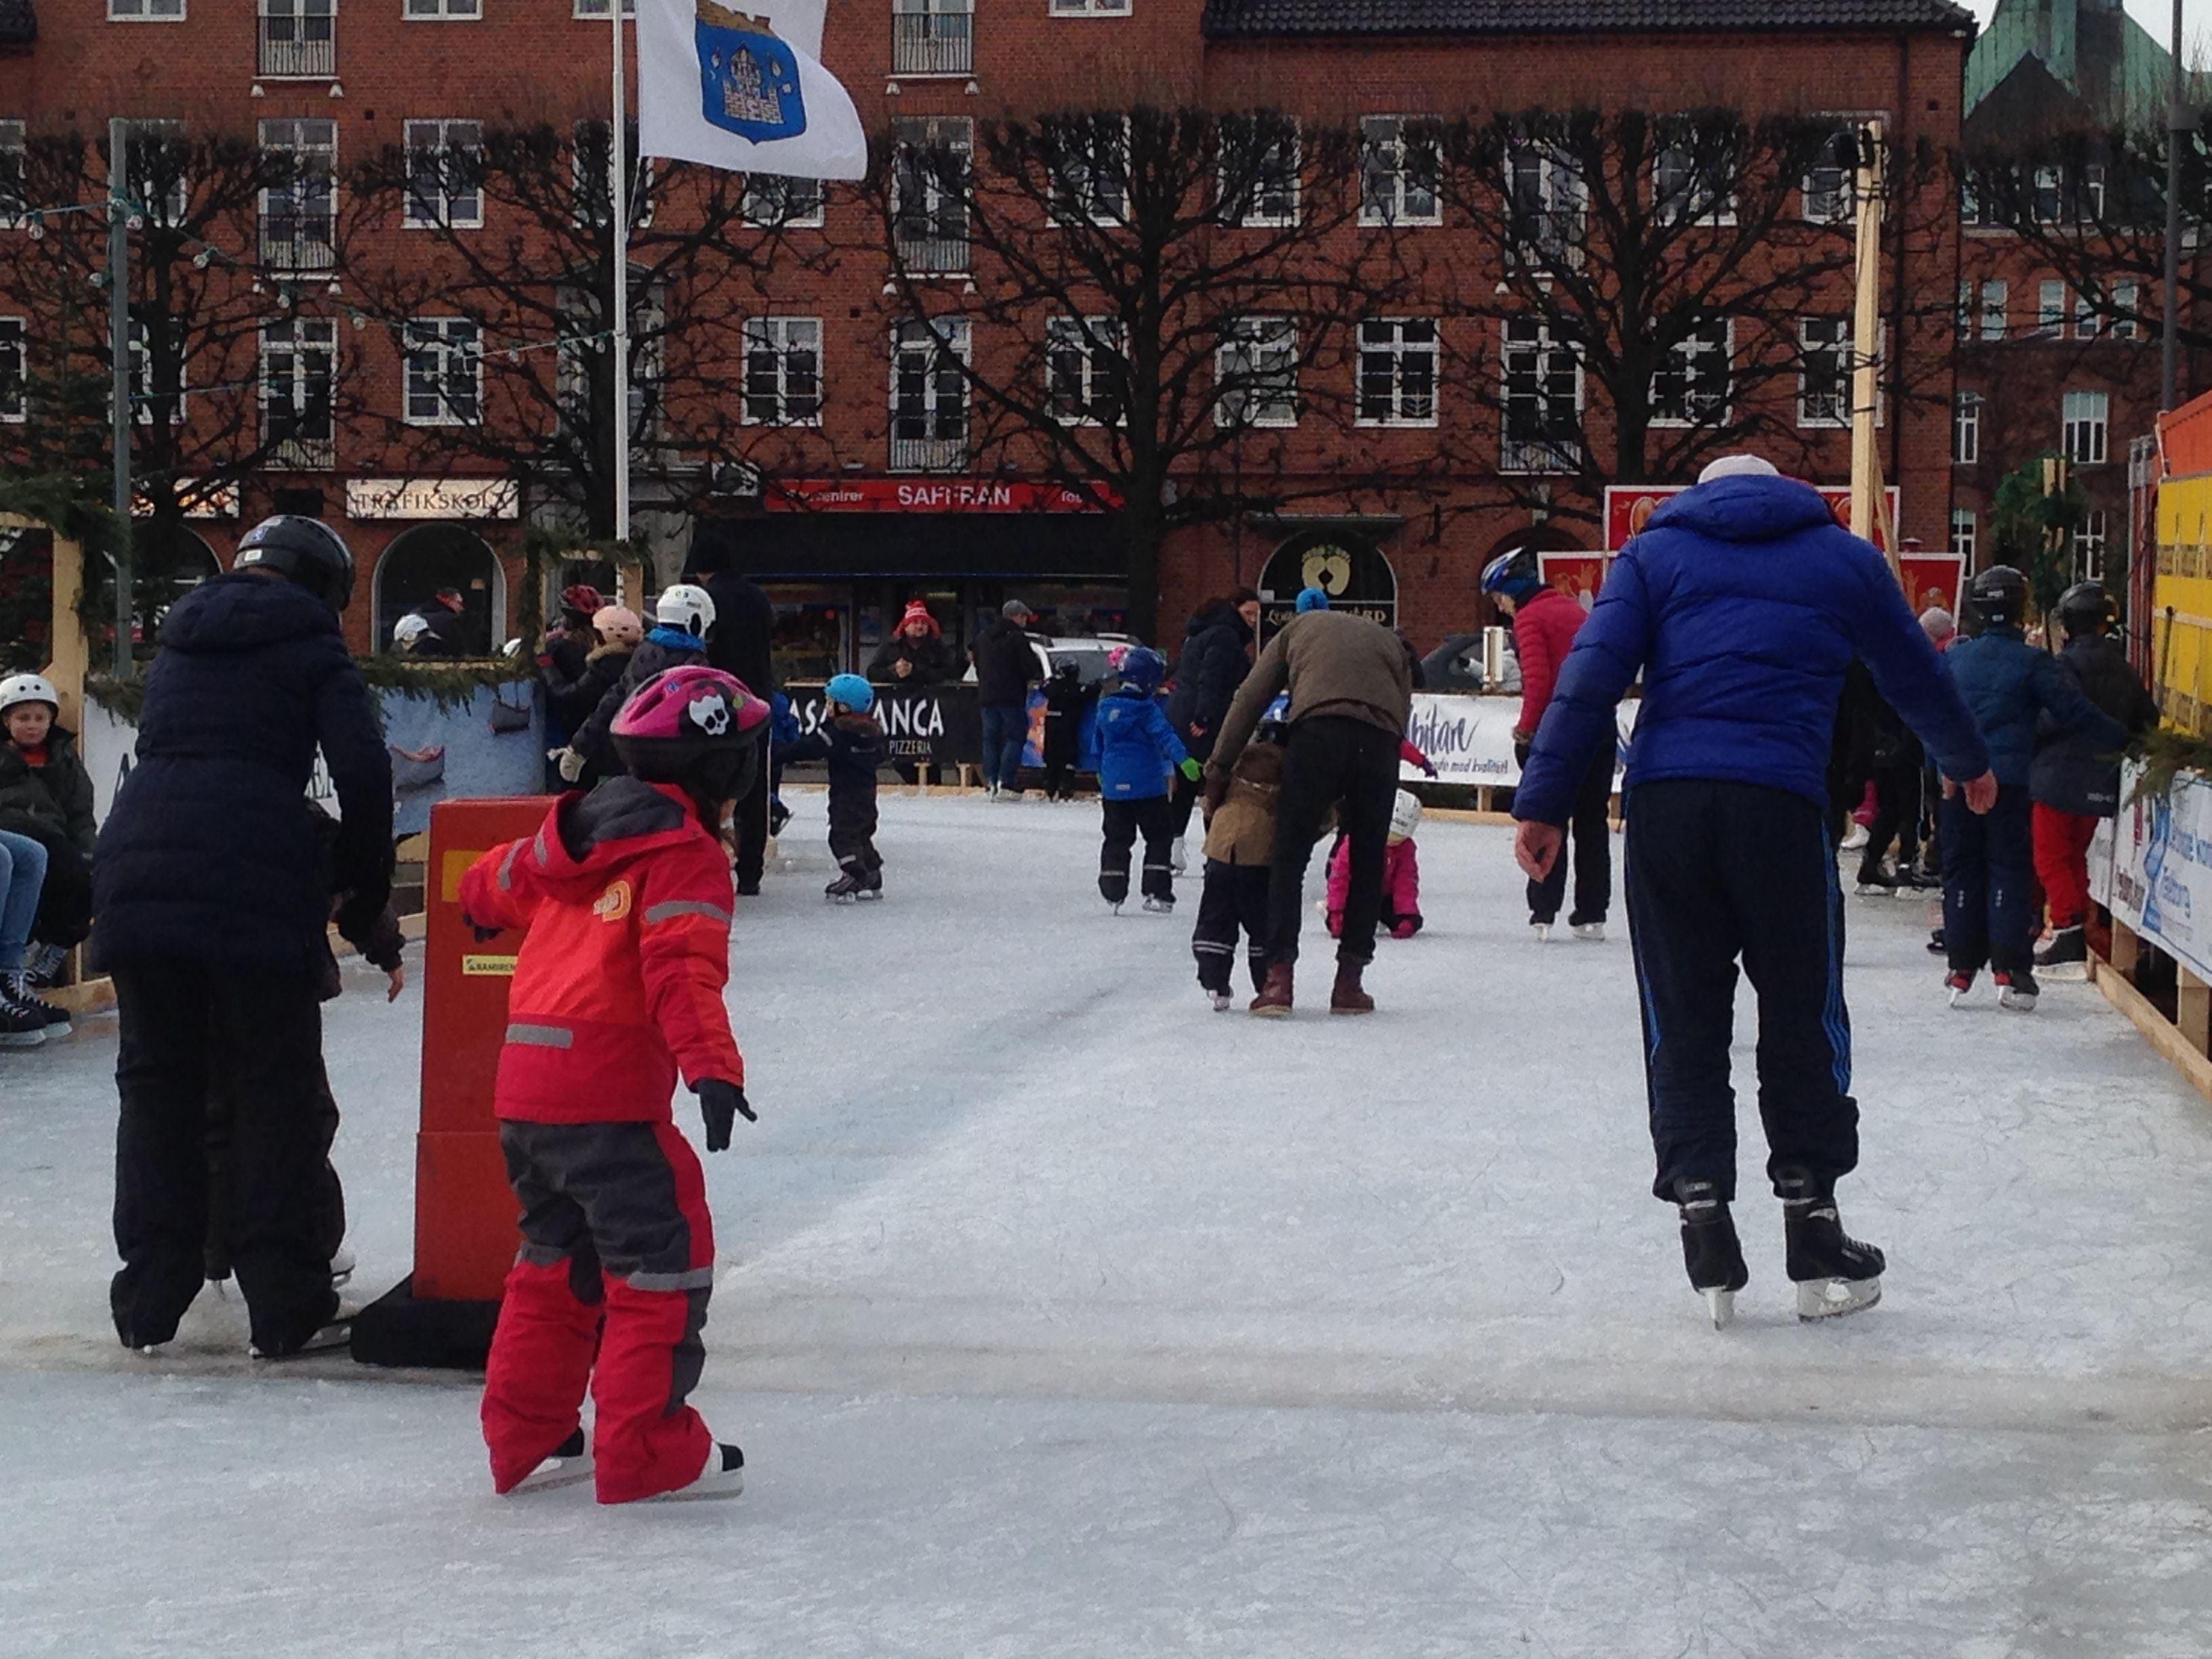 Susanne Nilsson,  © Susanne Nilsson, Trelleborgs kommun, Skridskor på Stortorget i Trelleborg